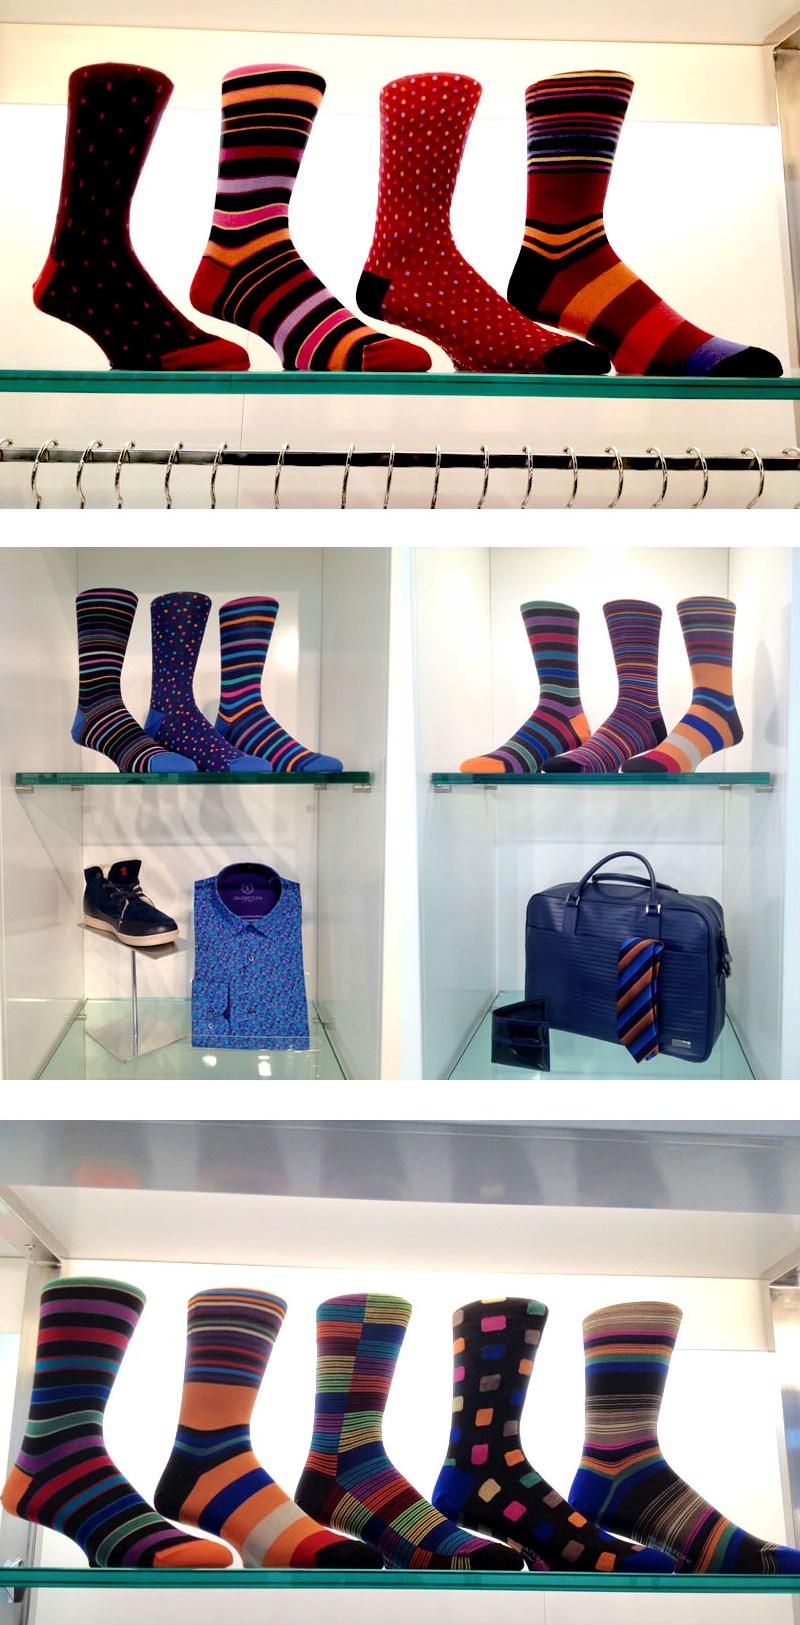 Bugatchi Uomo socks